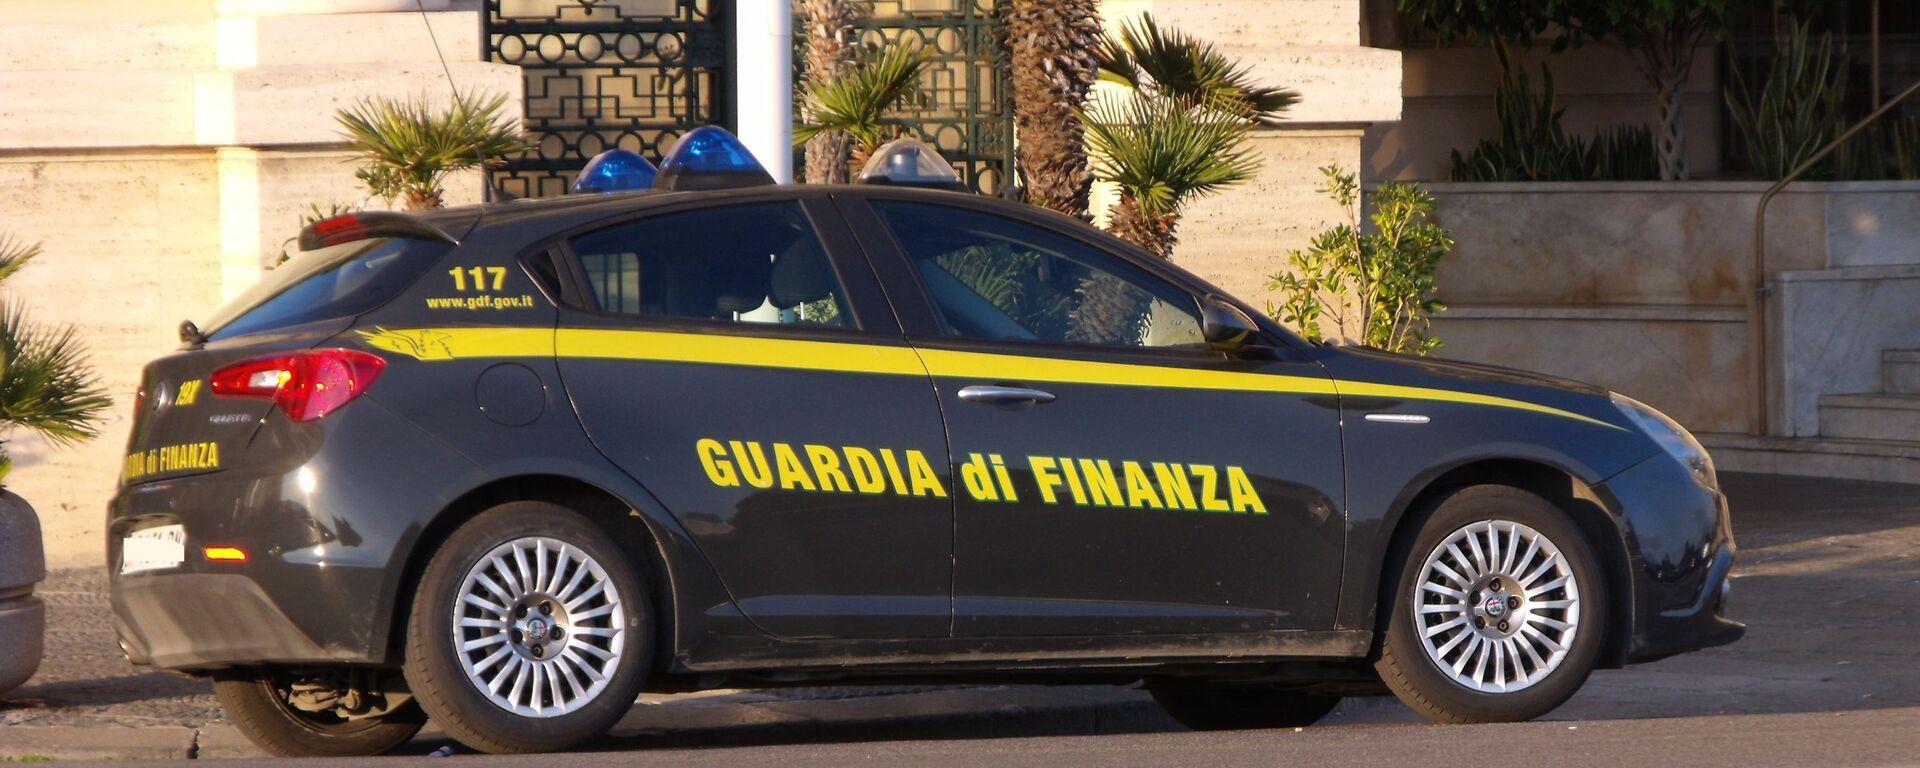 Autovettura guardia di finanza - Sputnik Italia, 1920, 30.07.2021